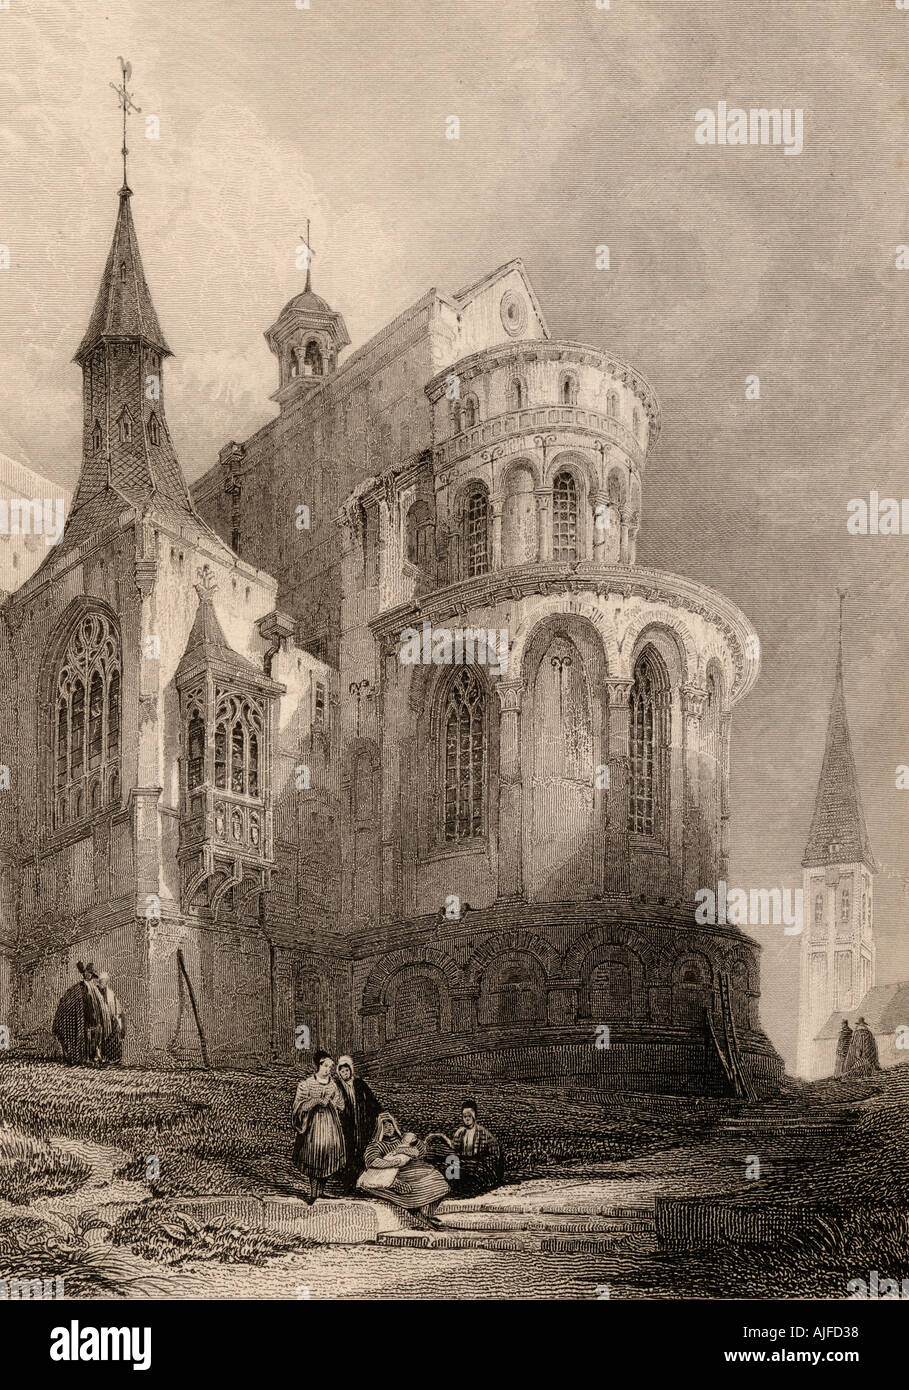 Iglesia de Santa Maria im Kapitol, Colonia, Alemania. Imagen De Stock